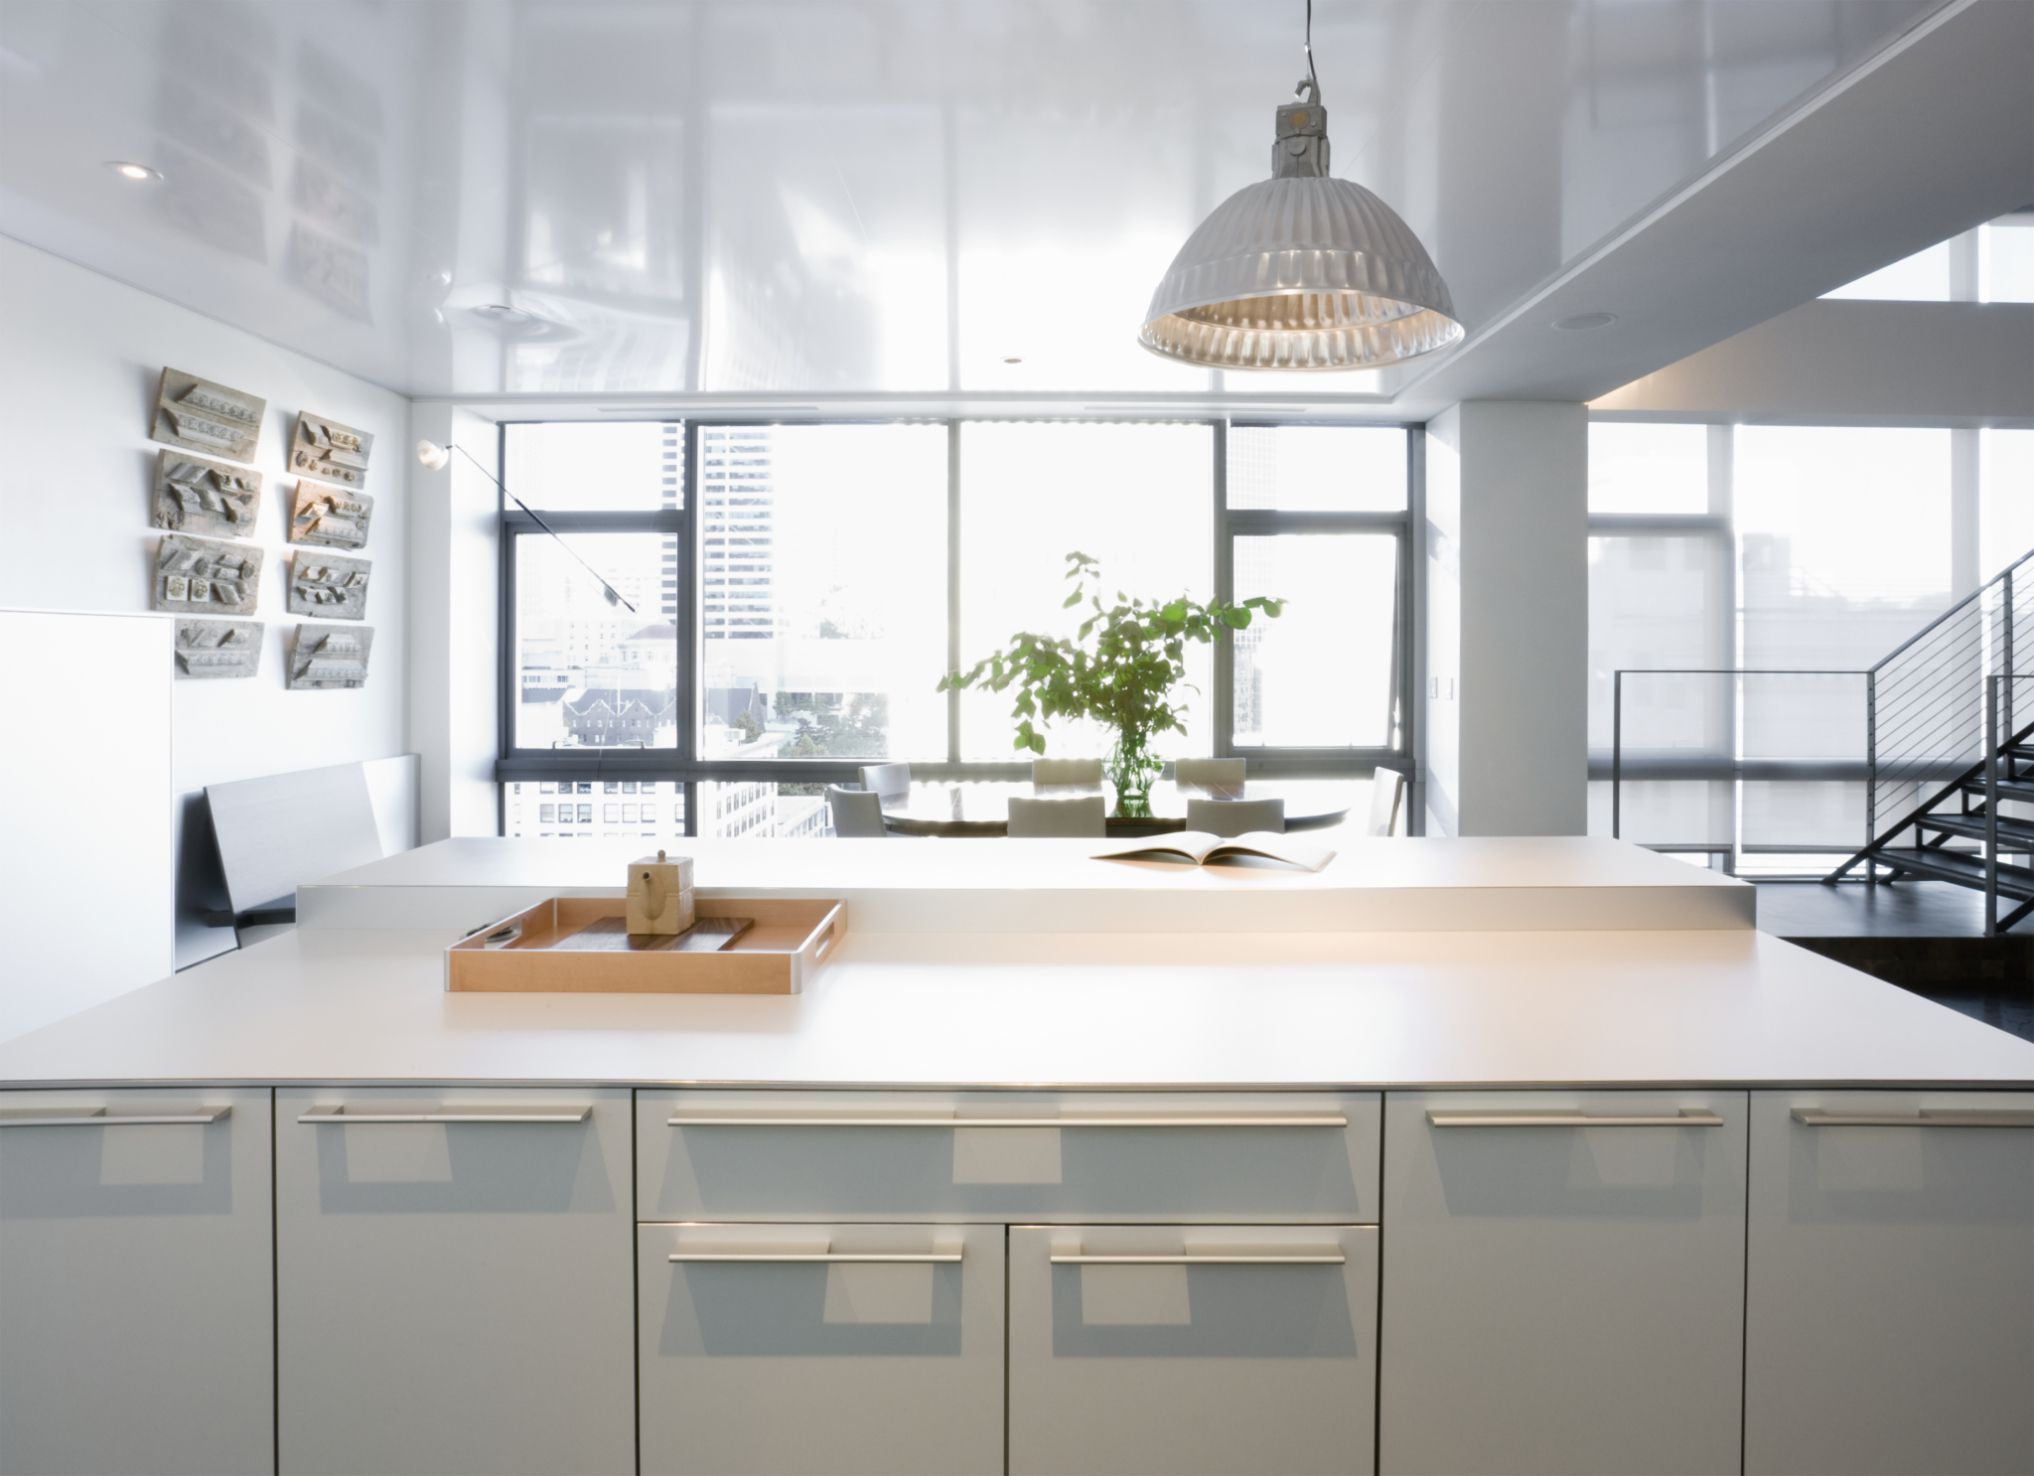 Kitchen Counter Kitchen Counter N Ilblco